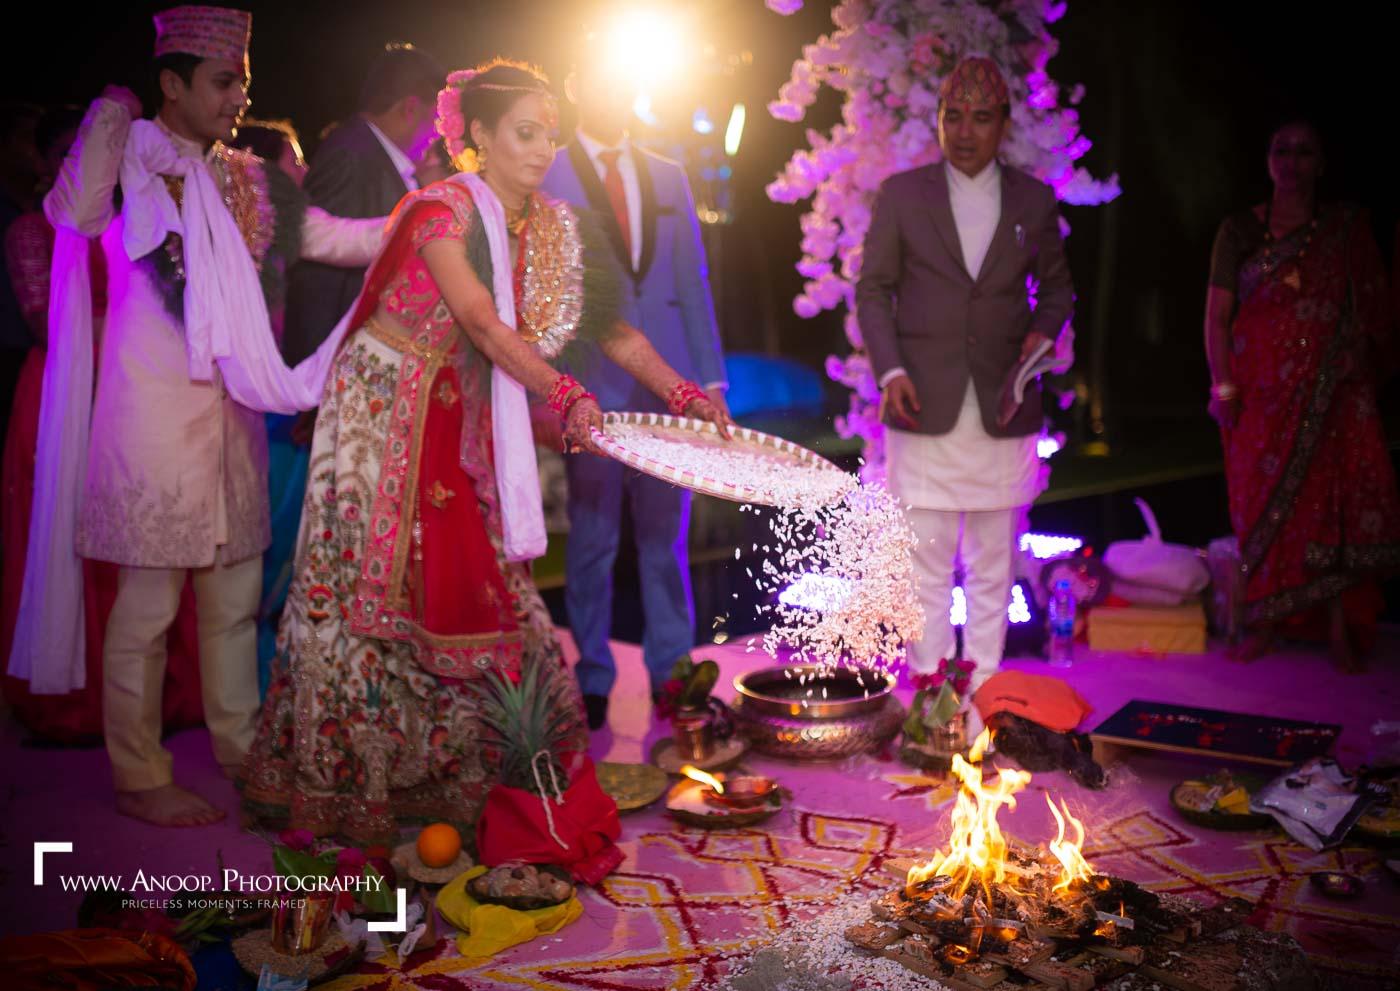 Destination-Nepali-Wedding-in-thailand-sheraton-hua-hin-024